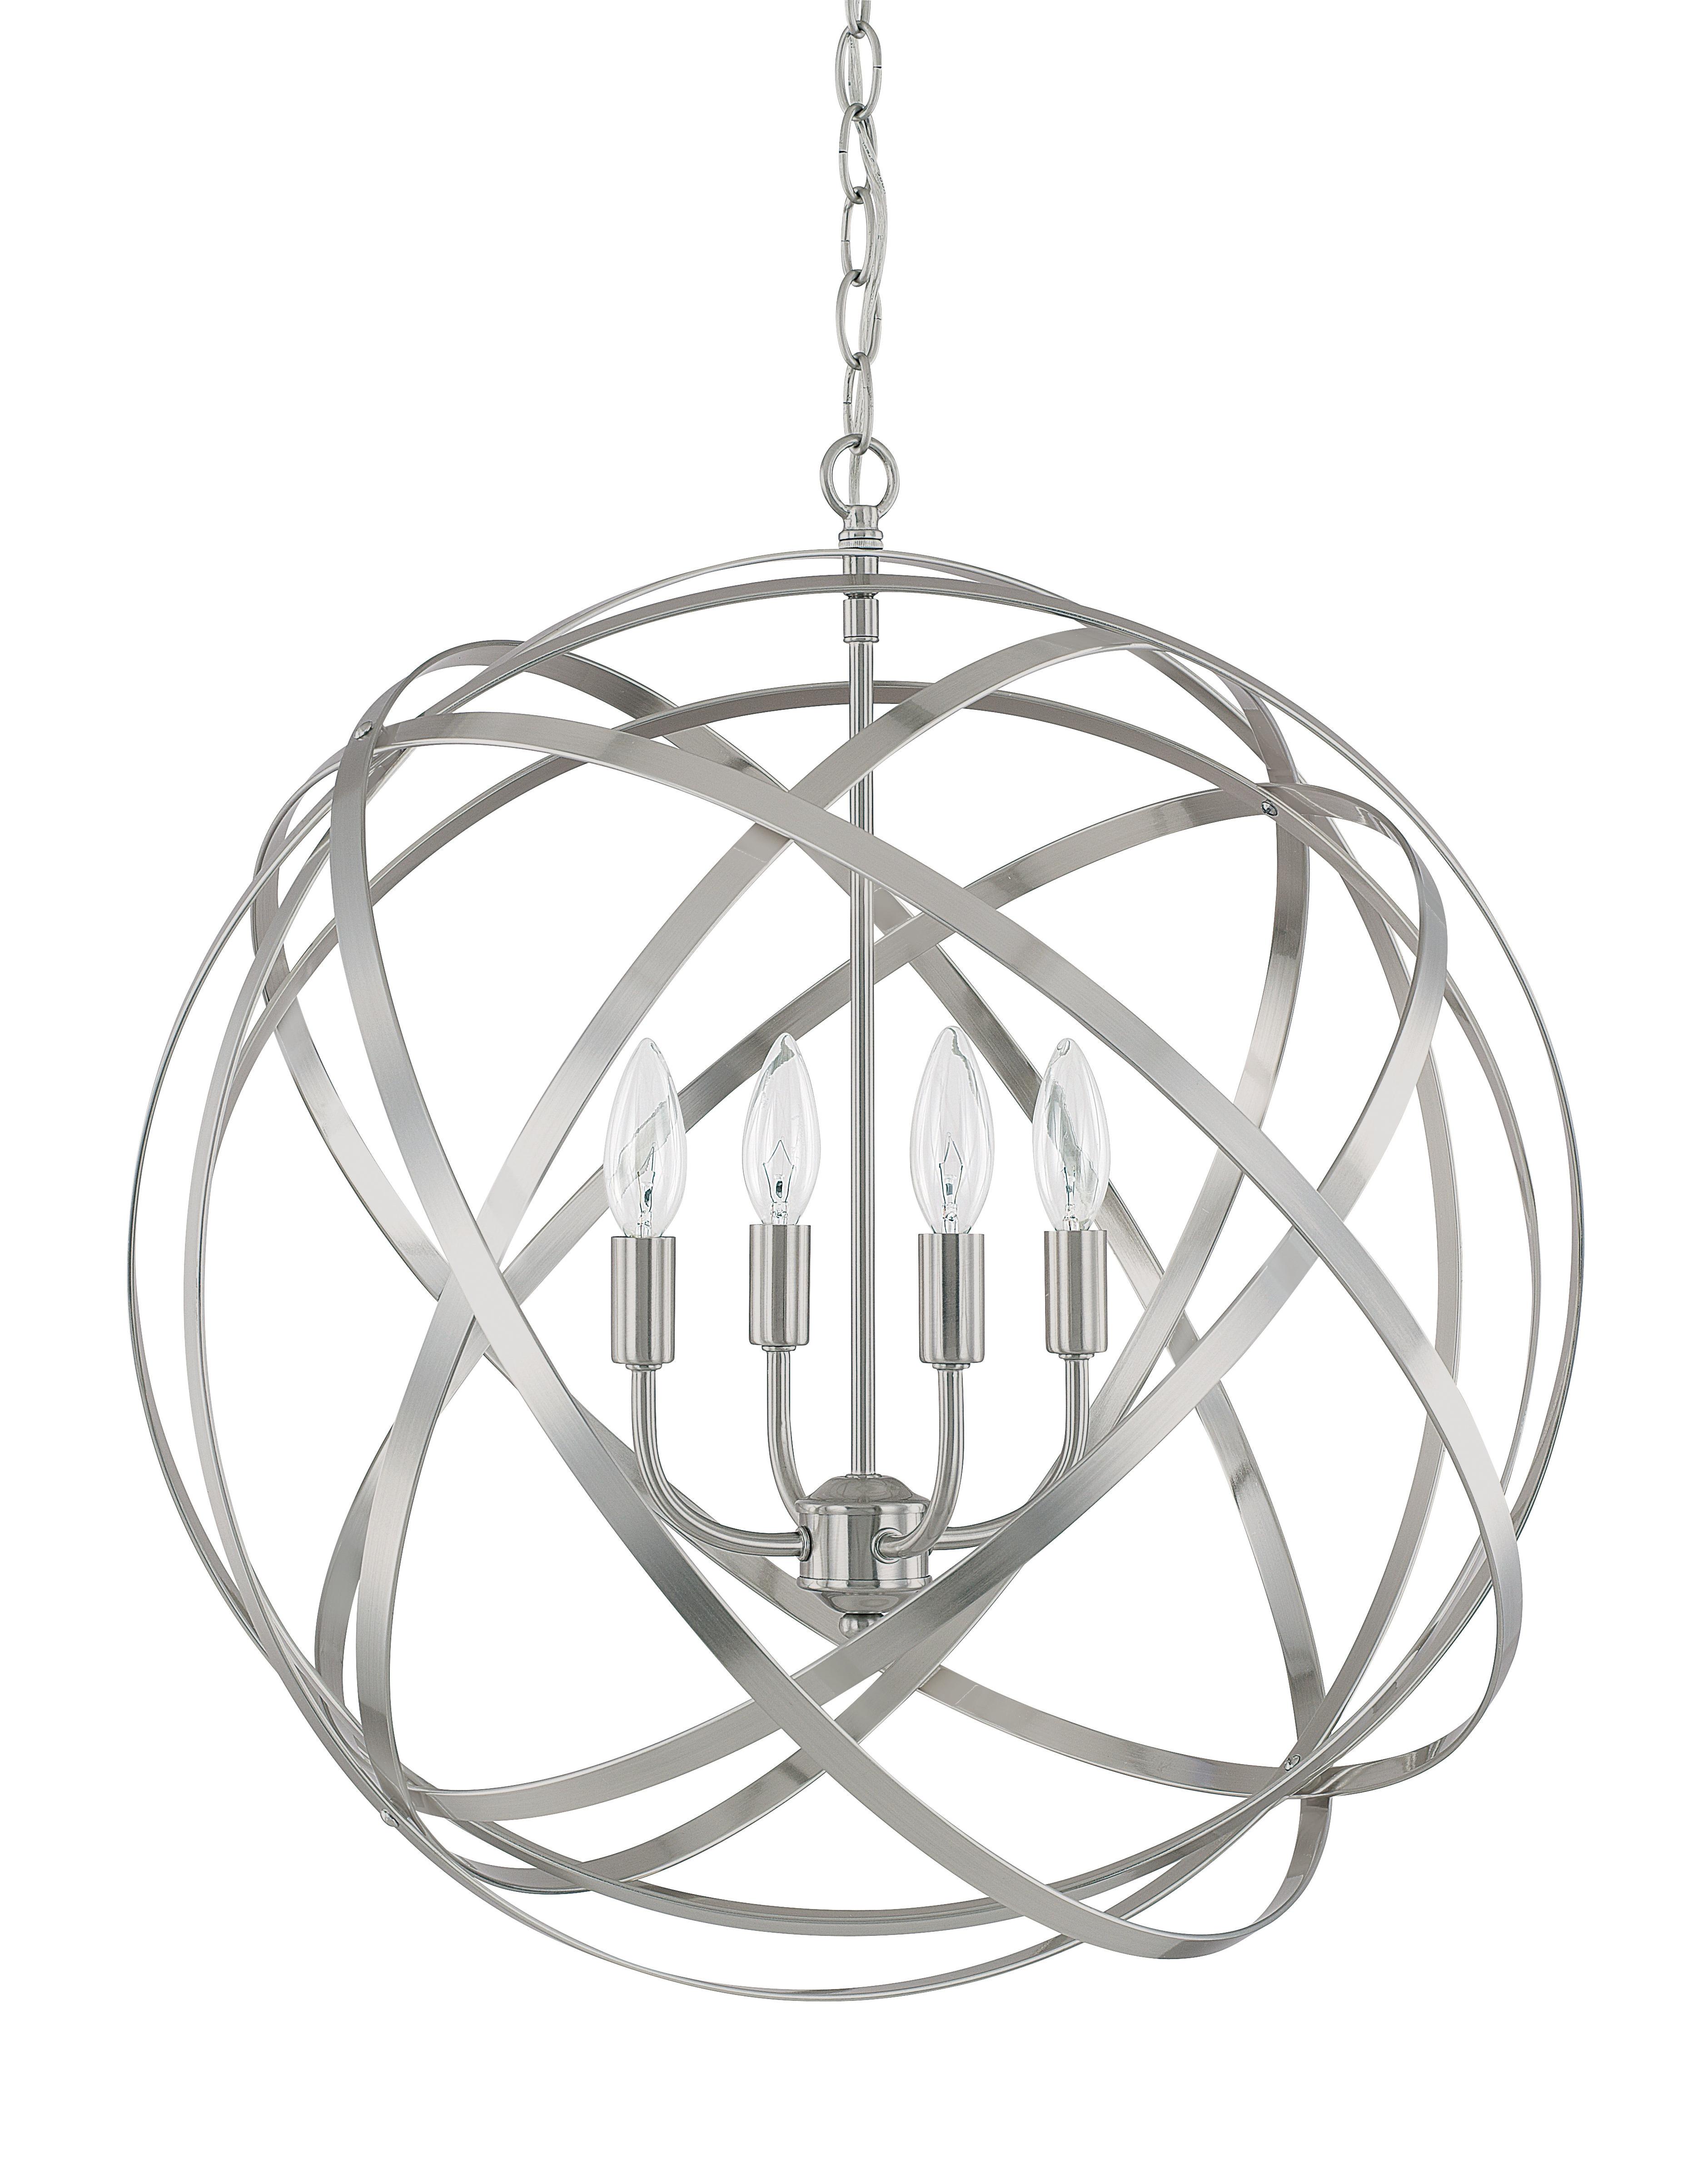 2019 Cavanagh 4 Light Geometric Chandeliers With Kierra 4 Light Unique / Statement Chandelier (View 3 of 25)